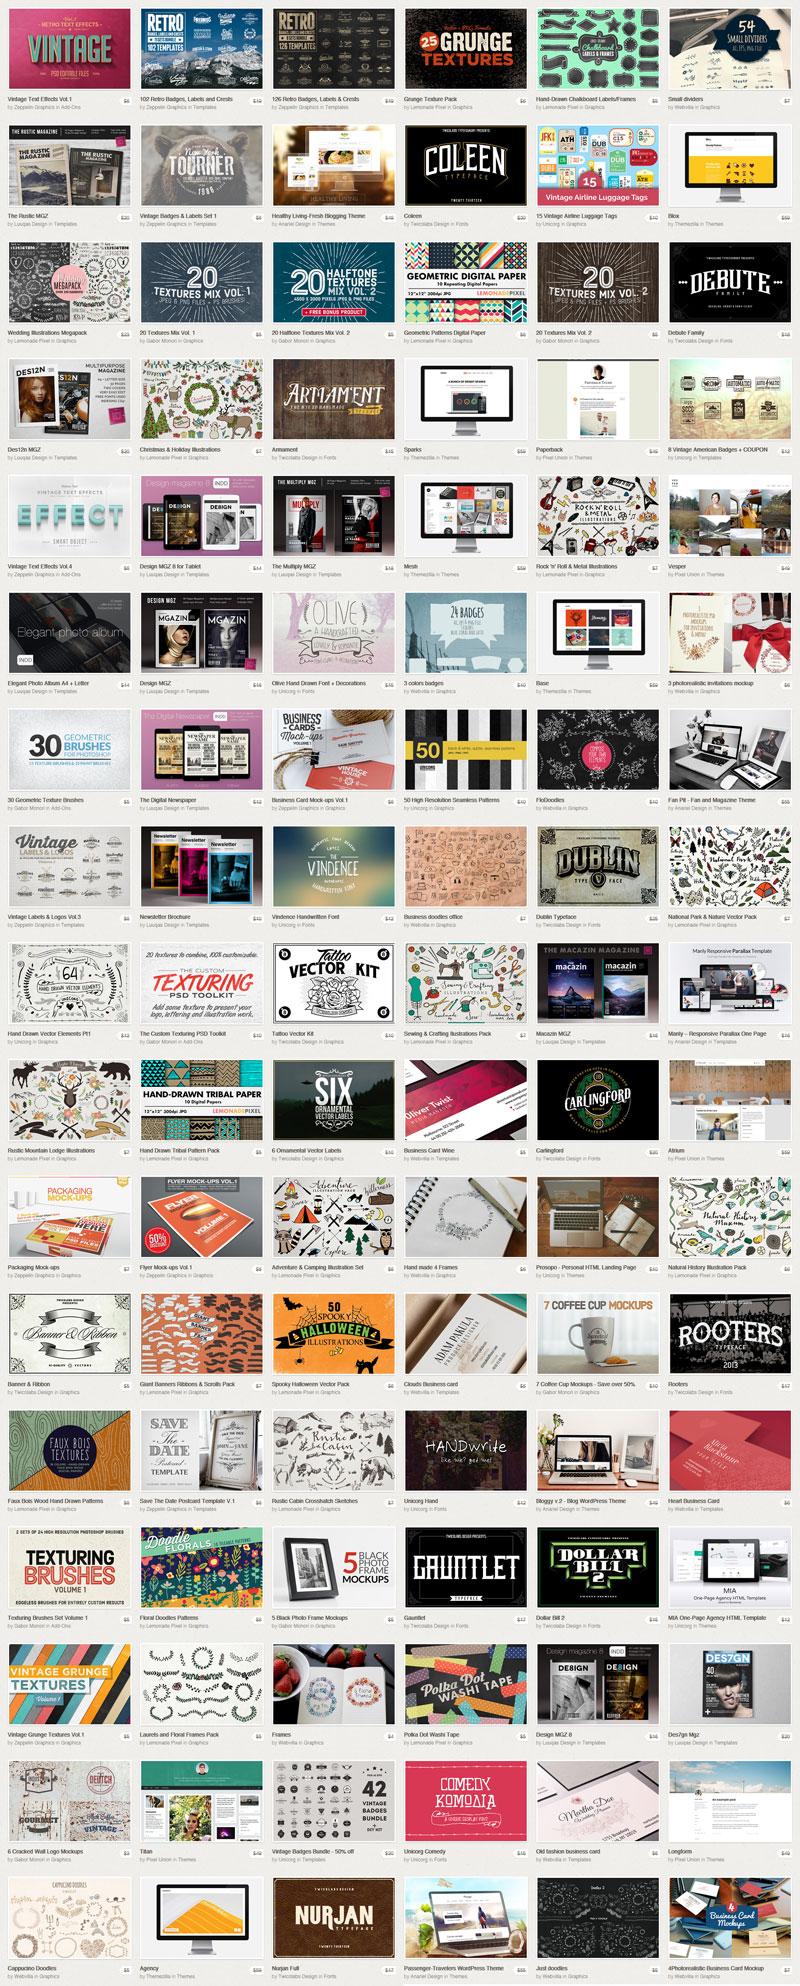 Big Bundle Vol. 2 - The biggest bundle ever from Creative Market.